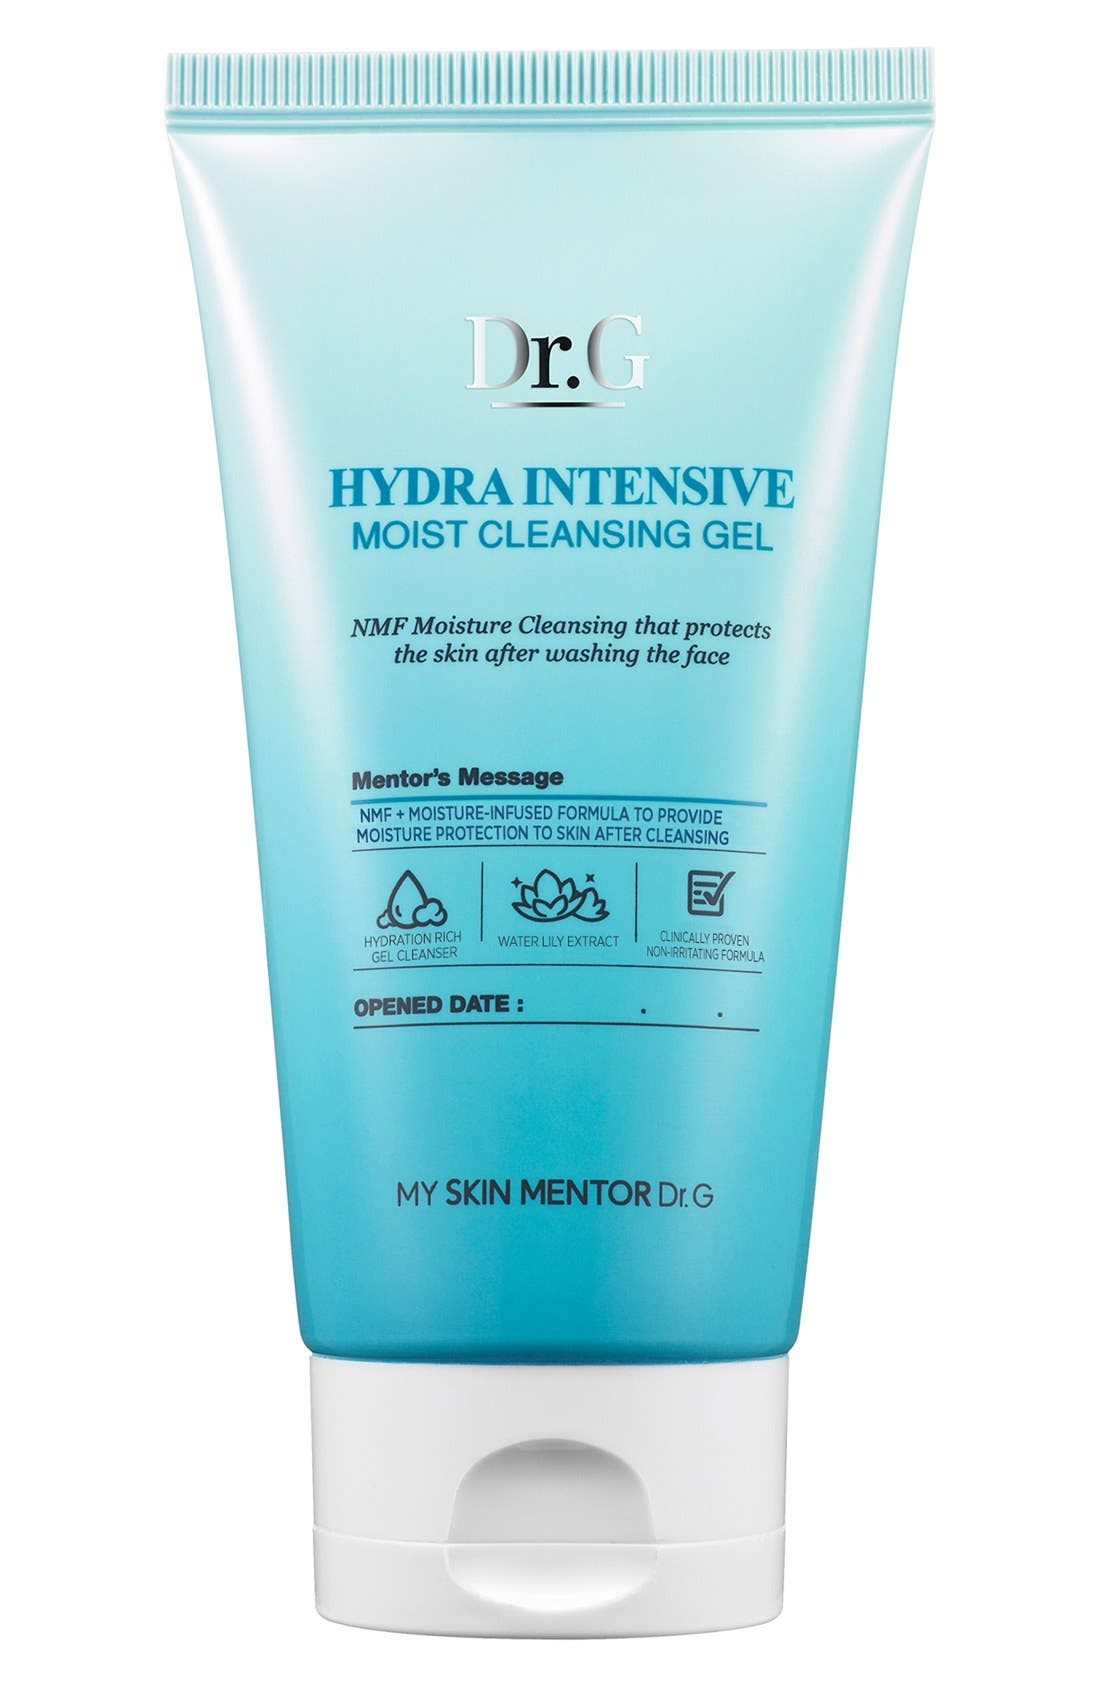 My Skin Mentor Dr. G Beauty 'Hydra Intensive' Moist Cleansing Gel